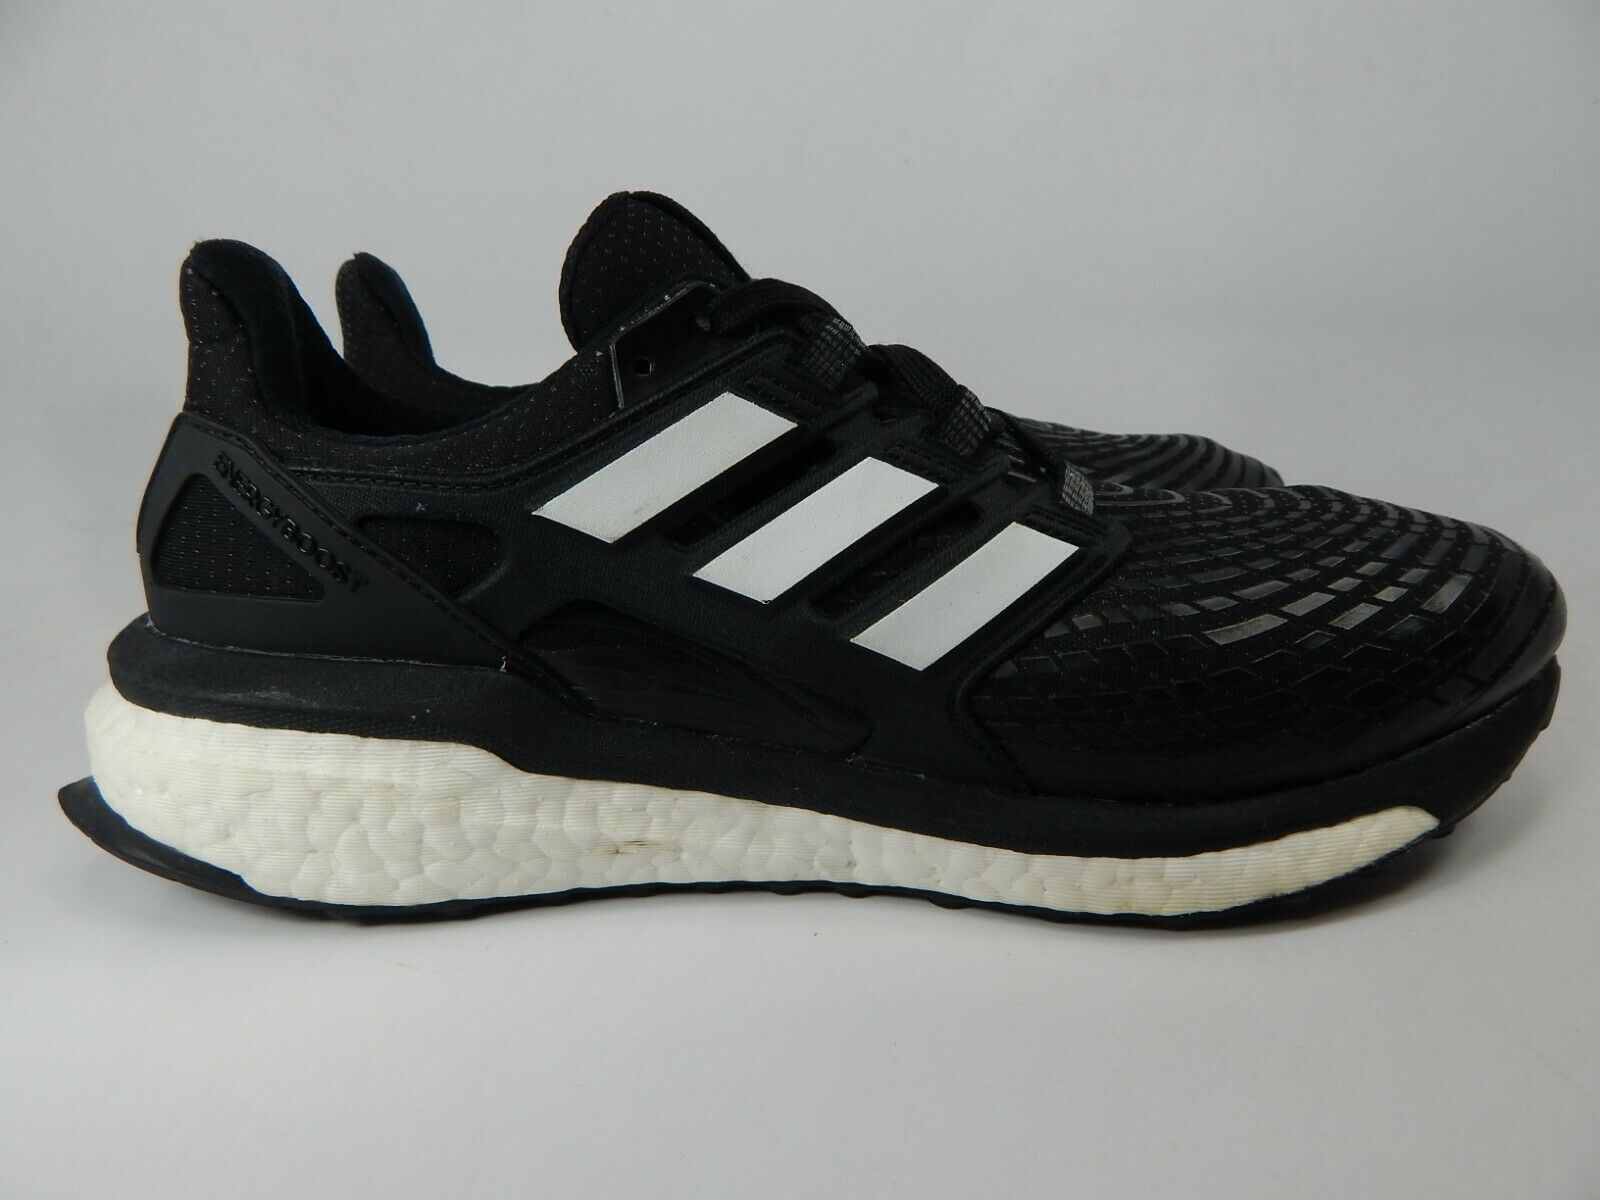 Adidas Energy Boost Misura USA 9.5 M (D) Eu 43 1/3 Uomo Scarpe da Corsa Nero